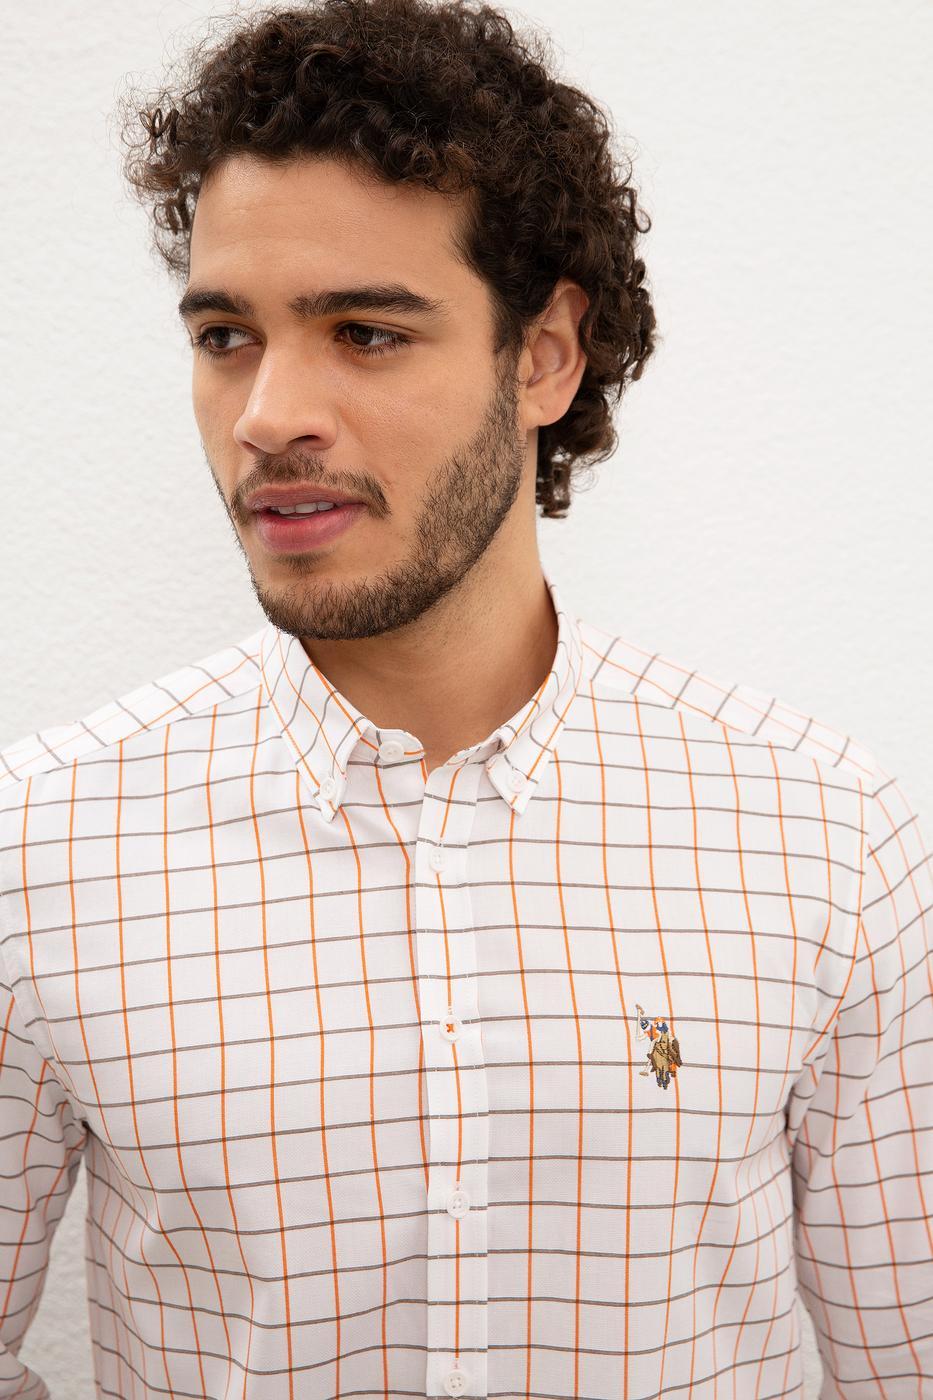 Turuncu Gömlek  Uzunkol